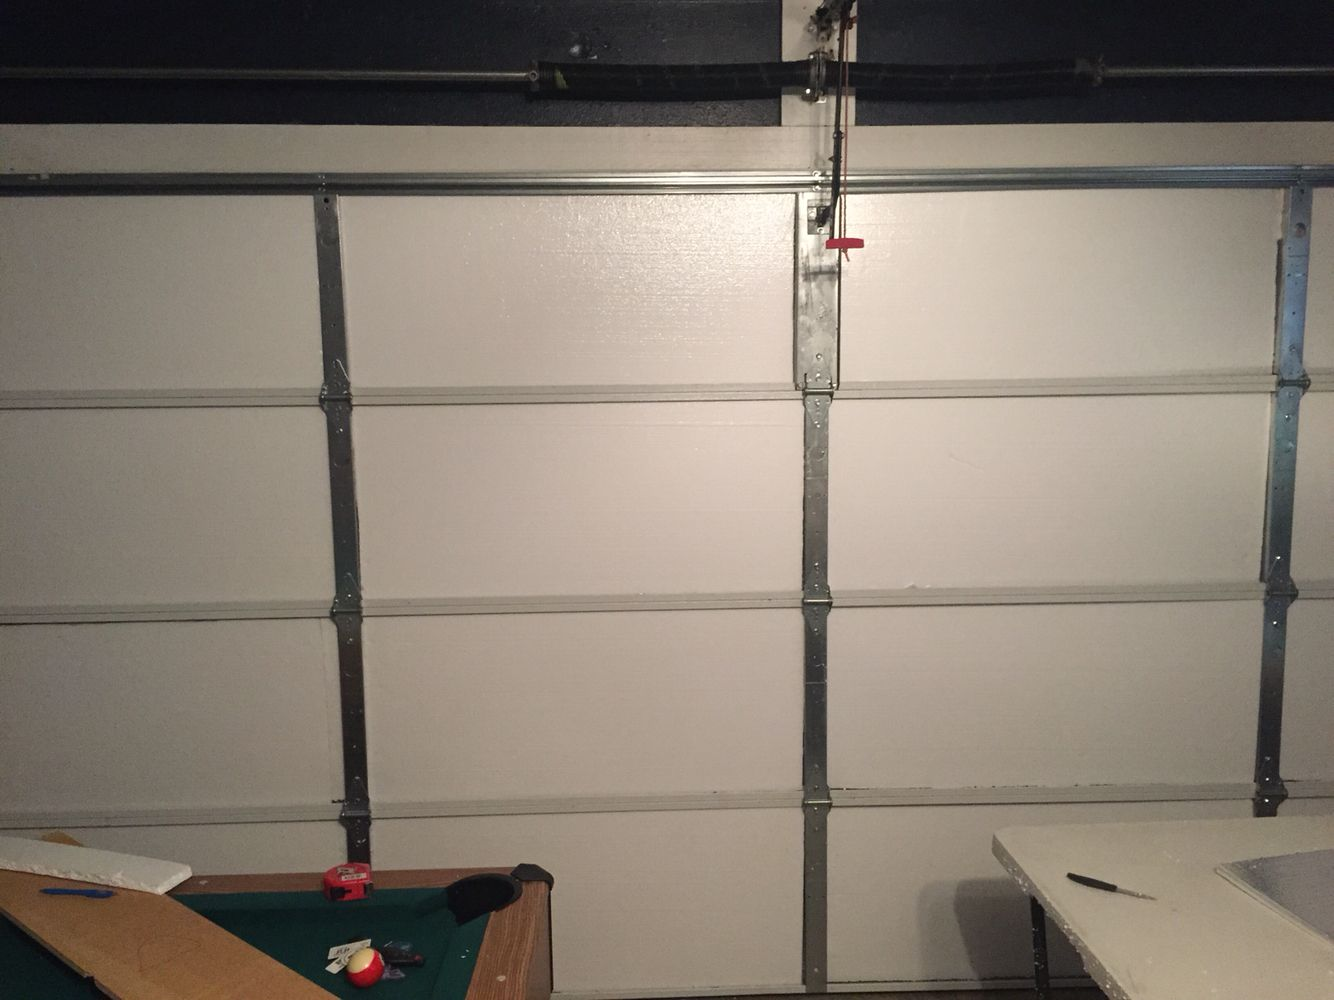 Diy Garage door insulation image by Albert Robinson Diy